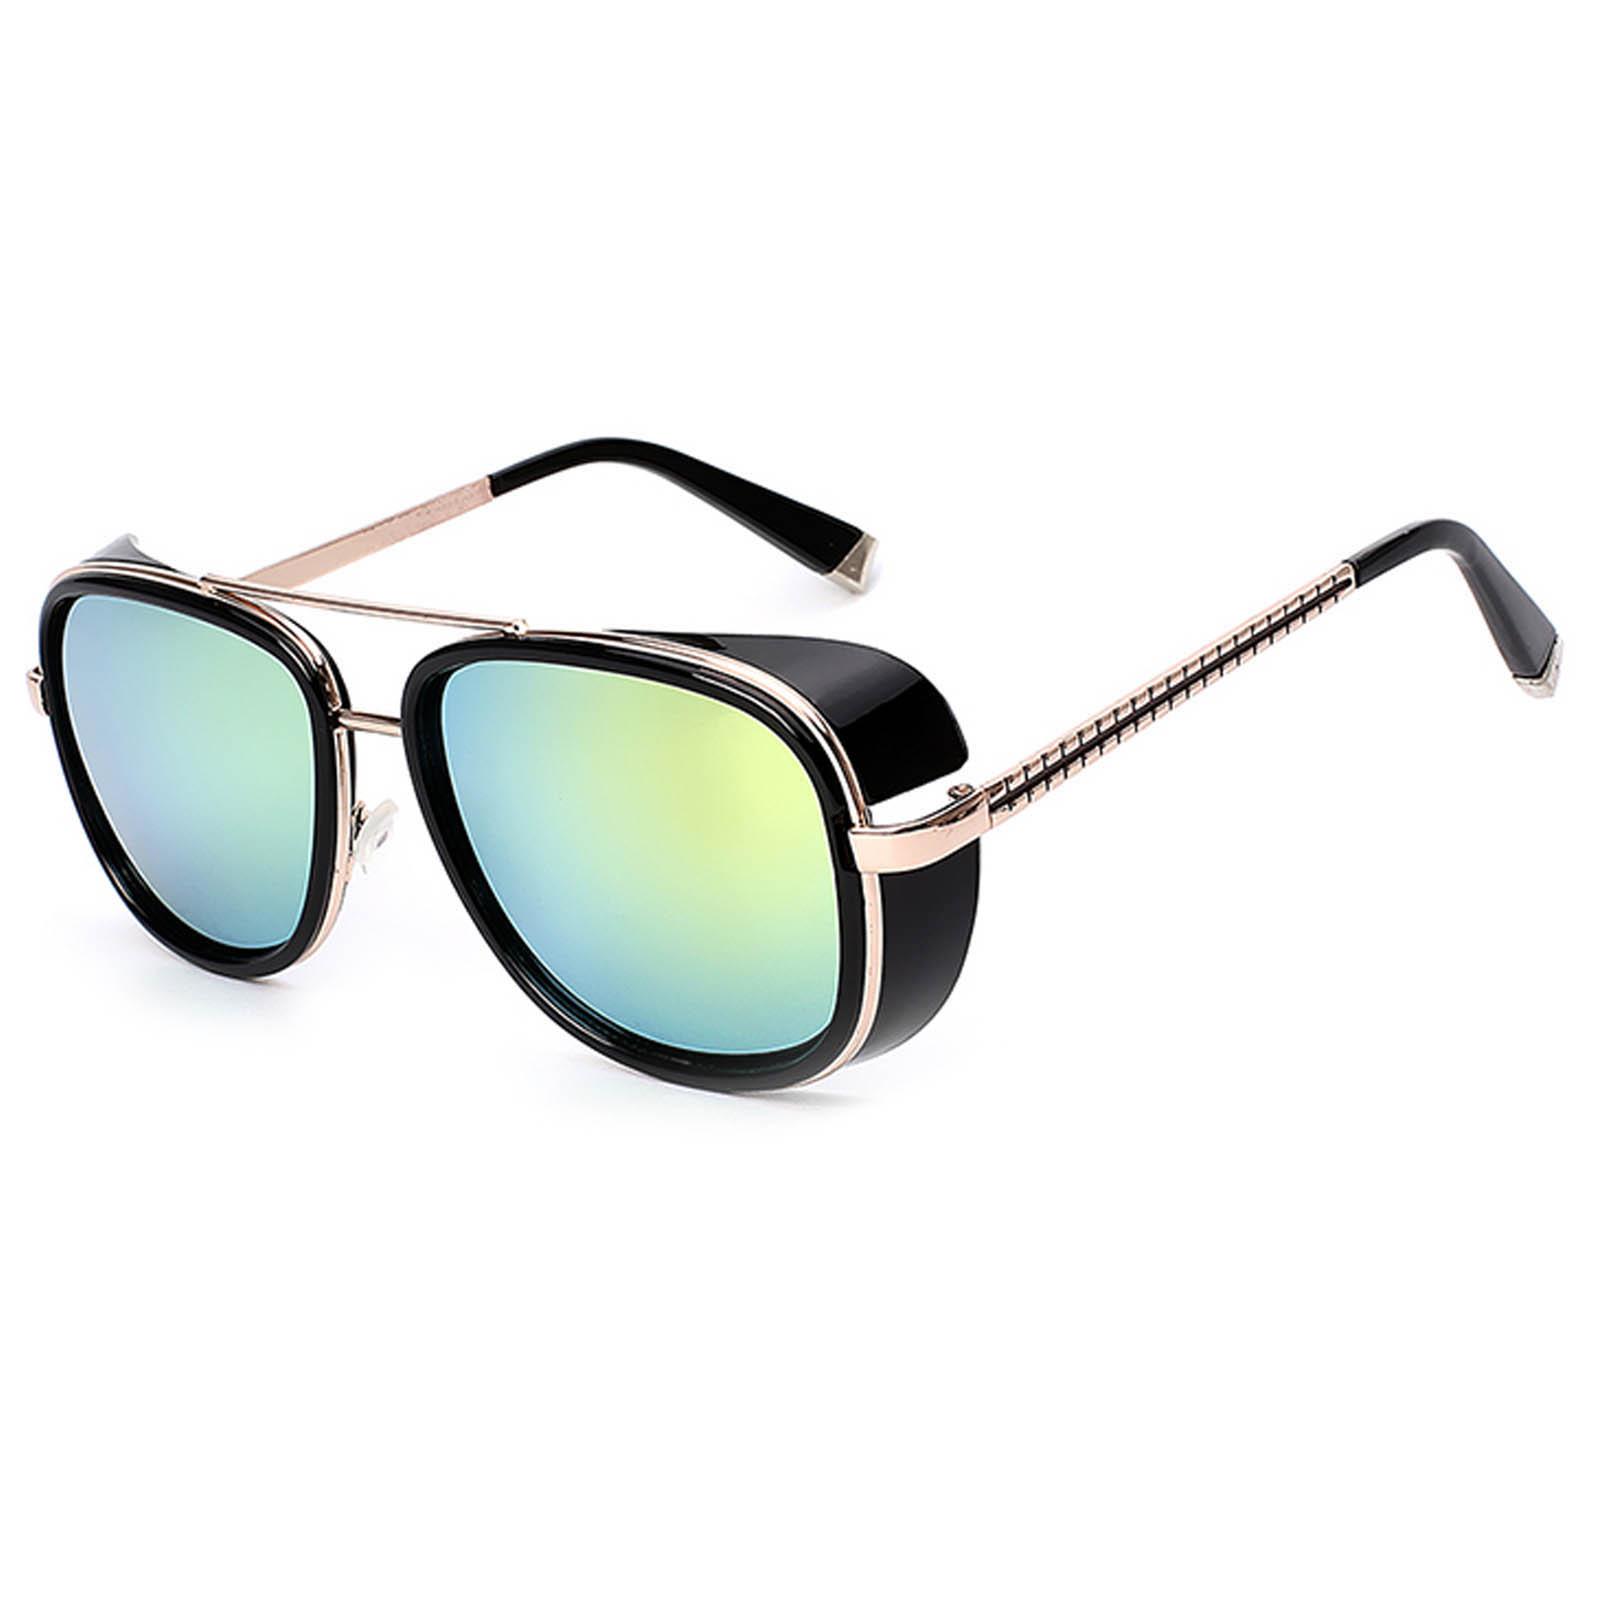 OWL ® 002 C7 Aviator Eyewear Sunglasses Women's Men's Metal Gold Frame Gold Lens One Pair